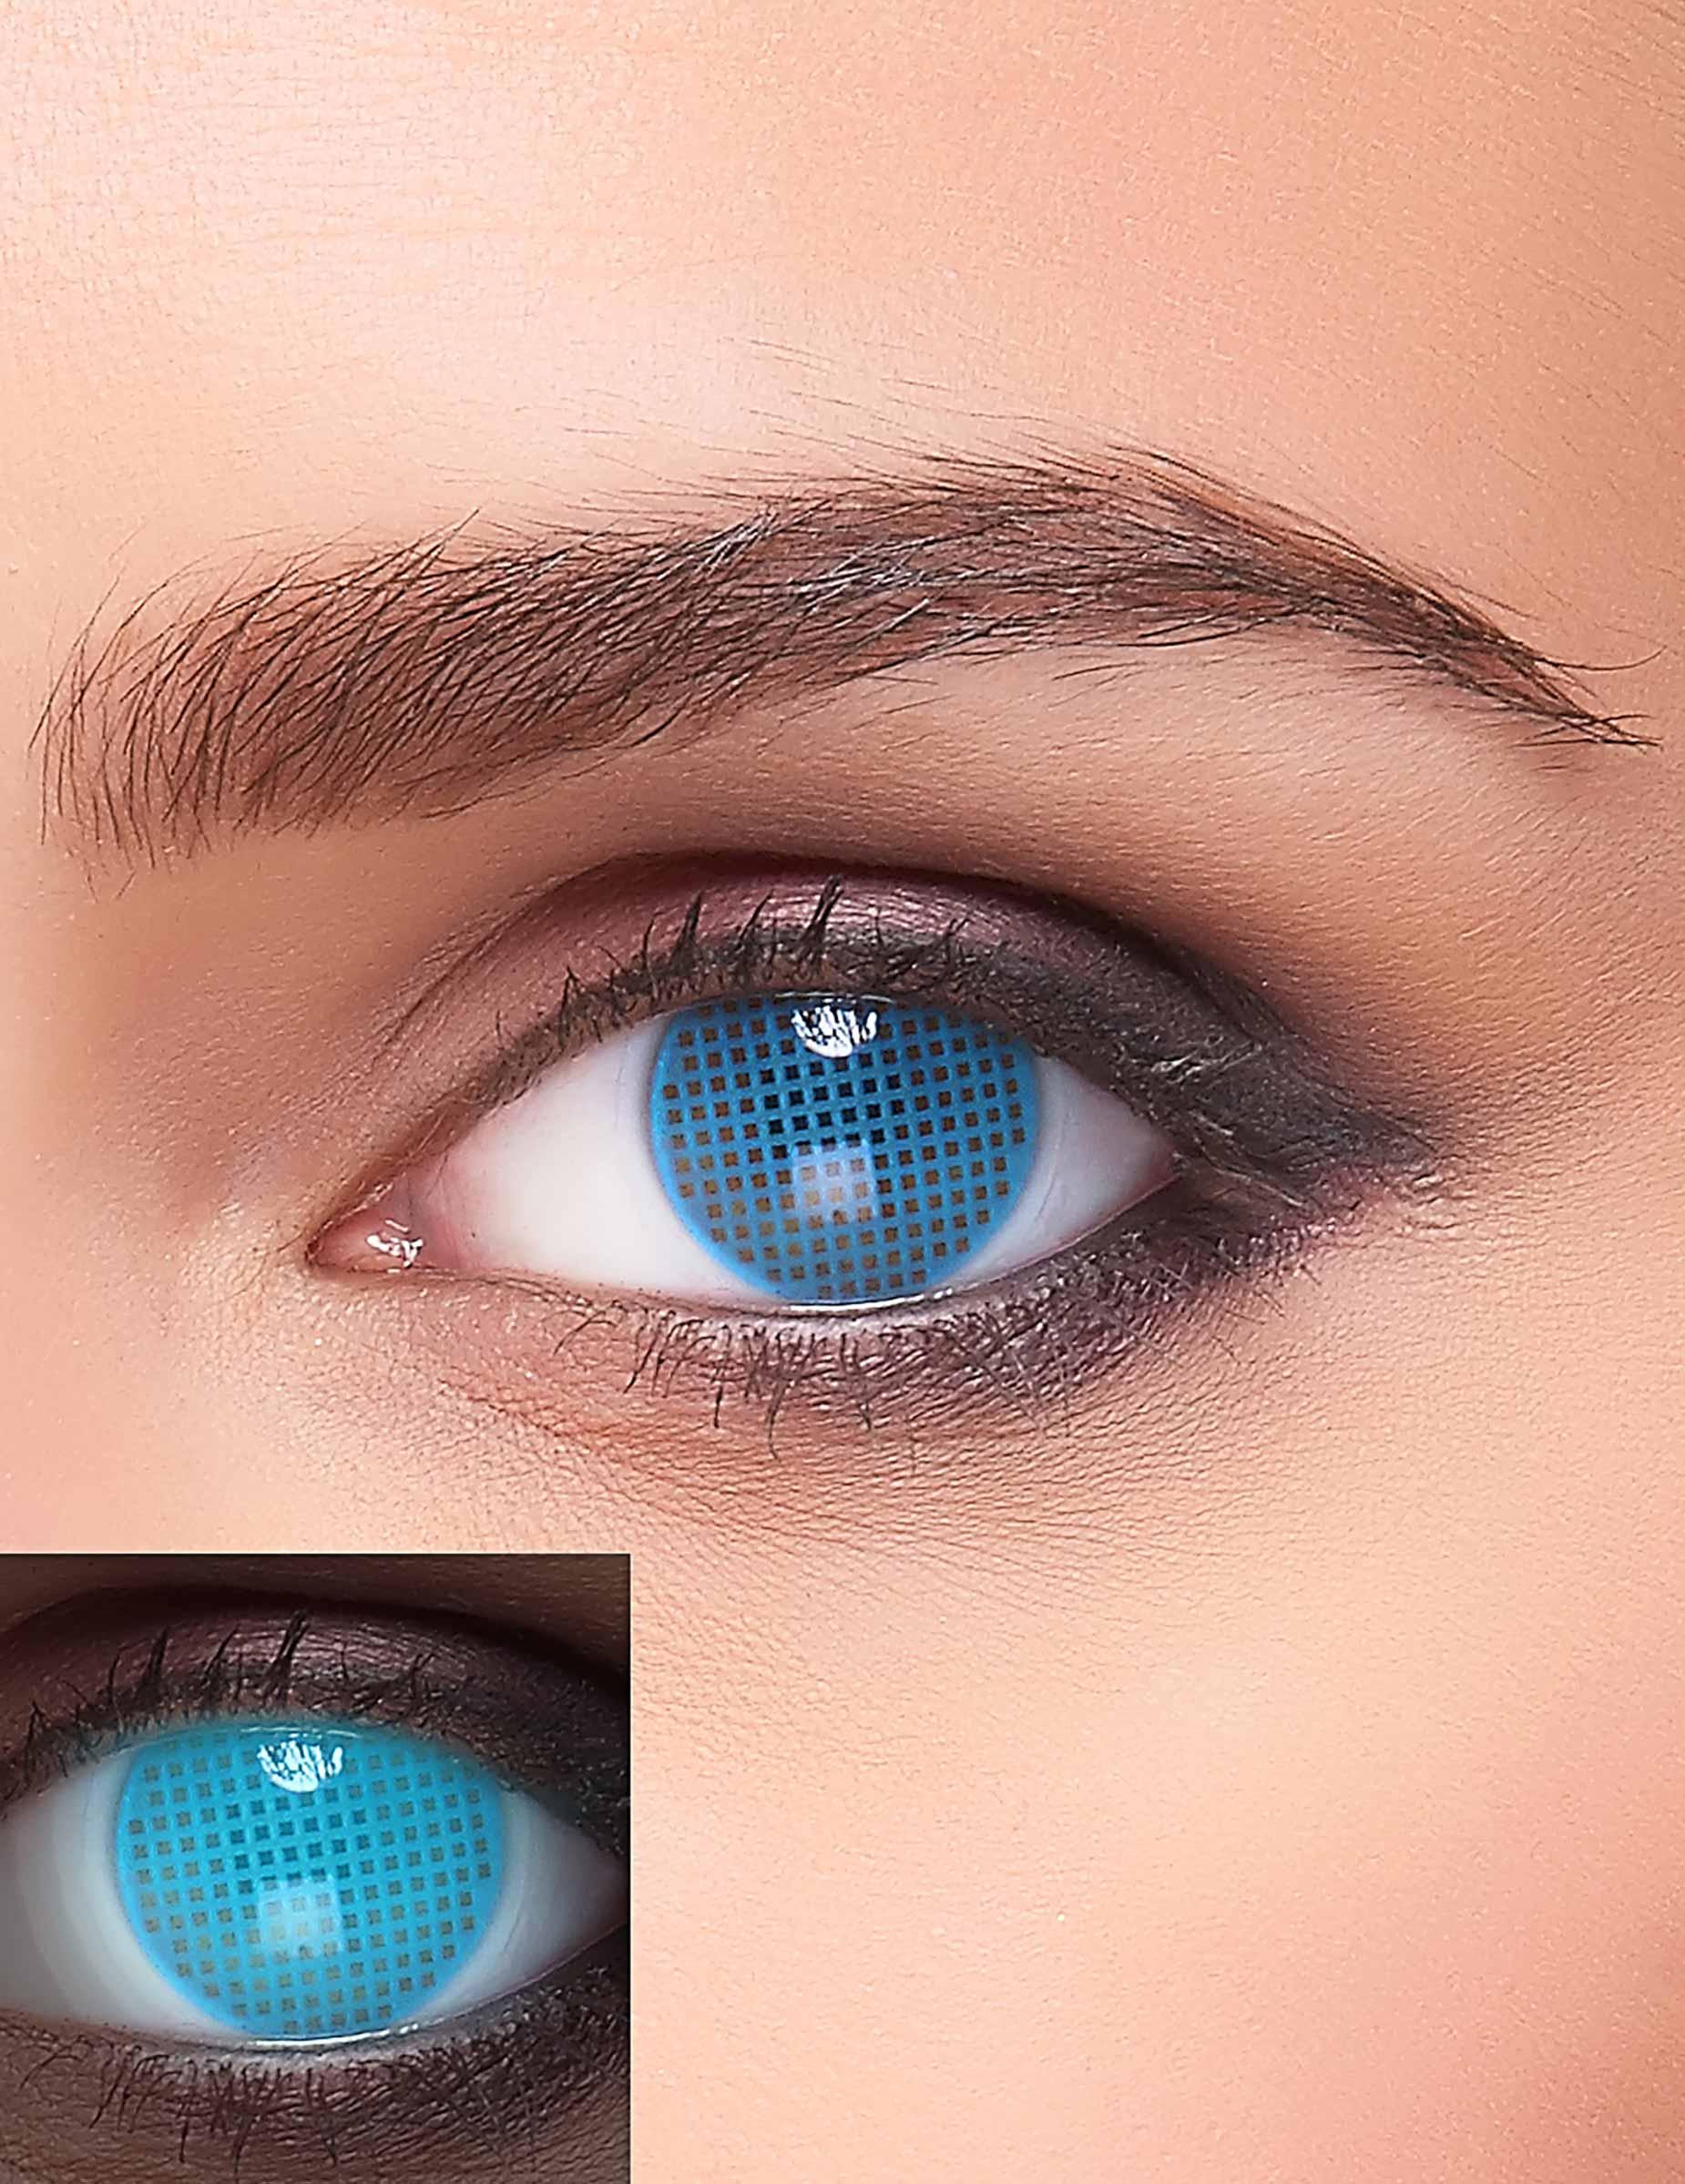 uv kontaktlinsen phantasie f r erwachsene blau schminke. Black Bedroom Furniture Sets. Home Design Ideas